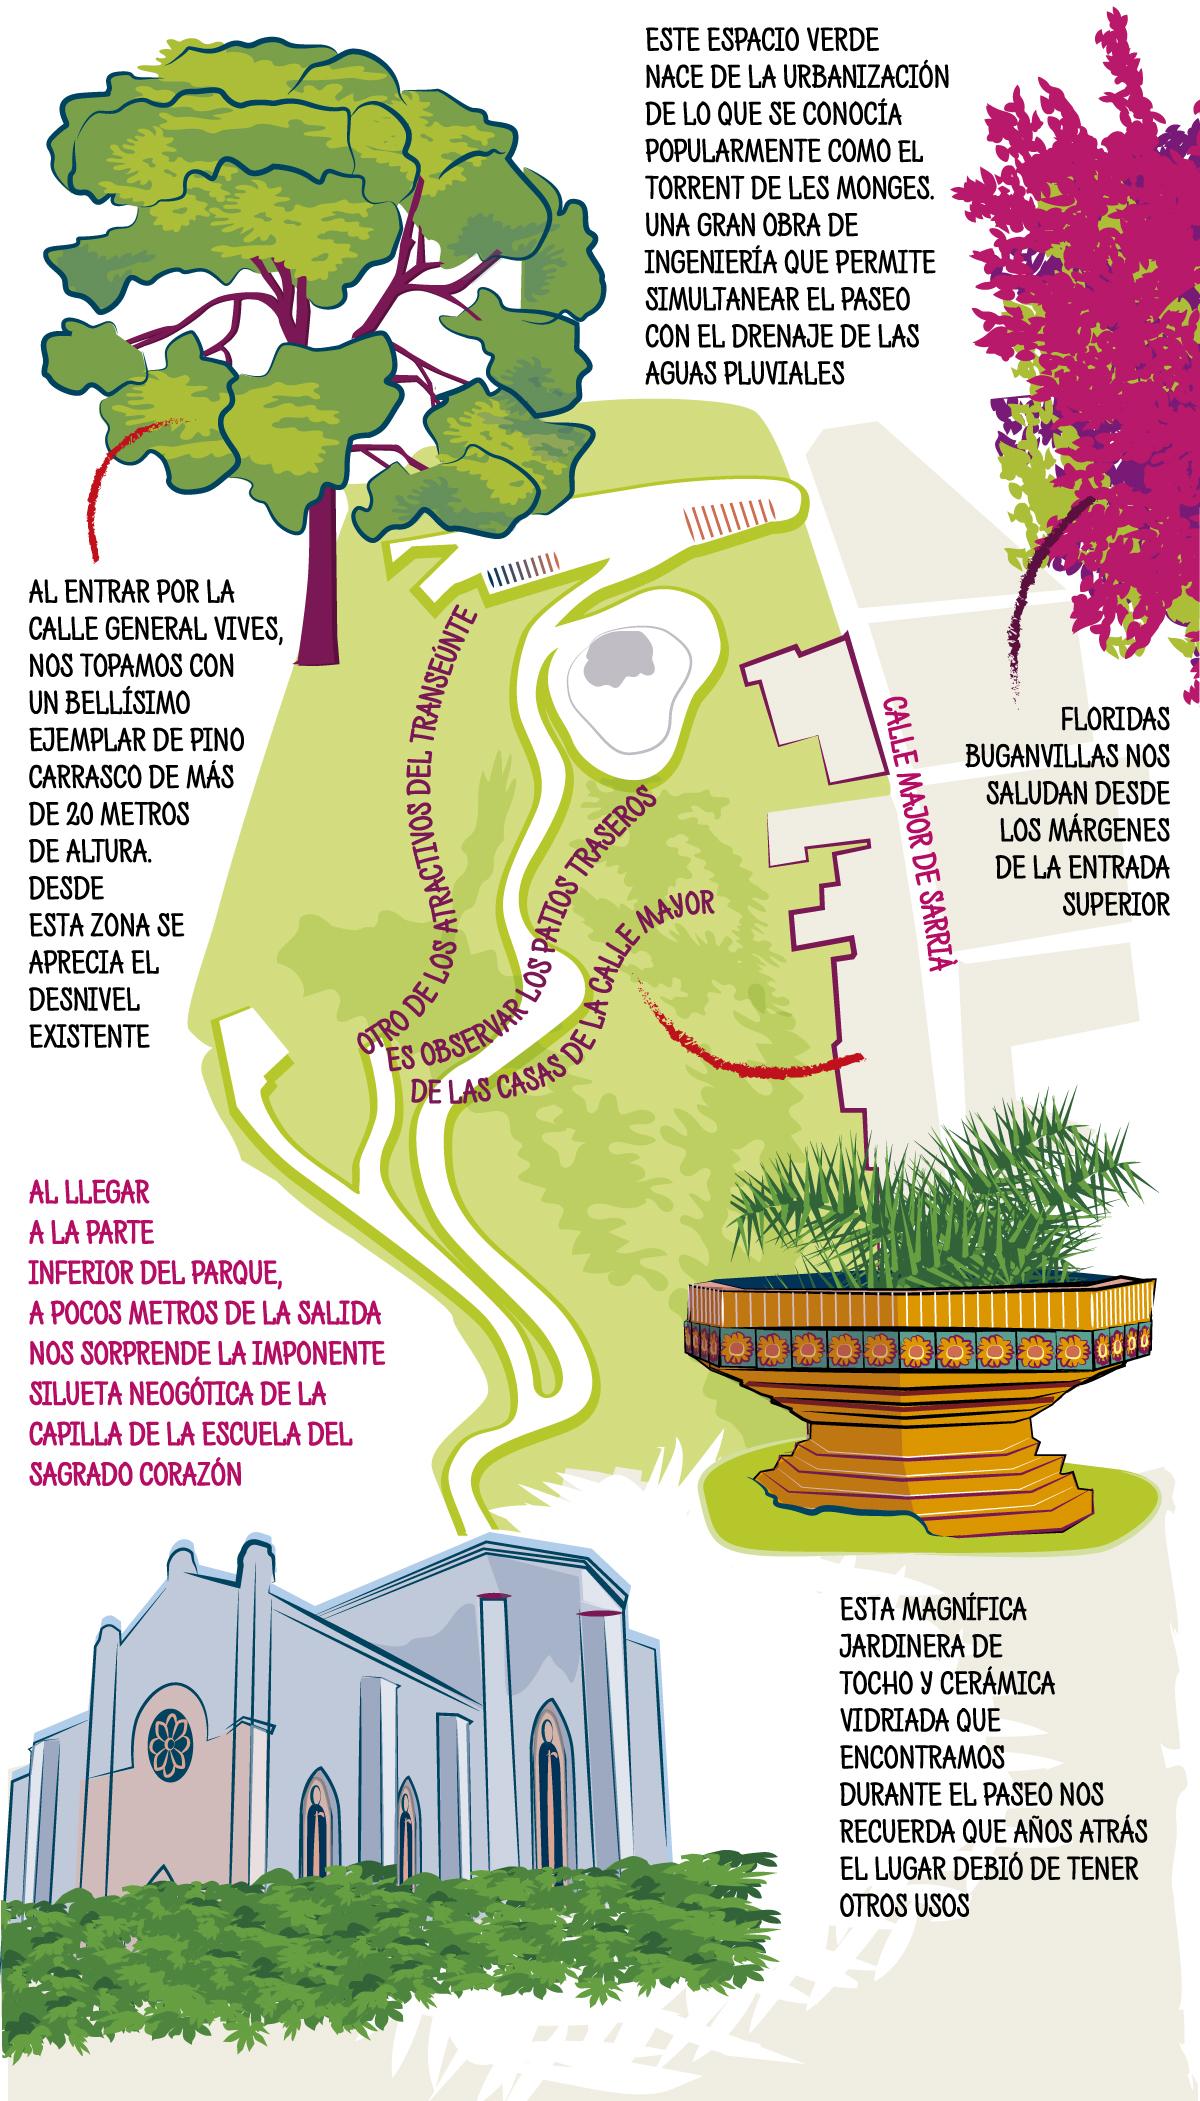 Parque de Joan Reventós: una zona verde diferente